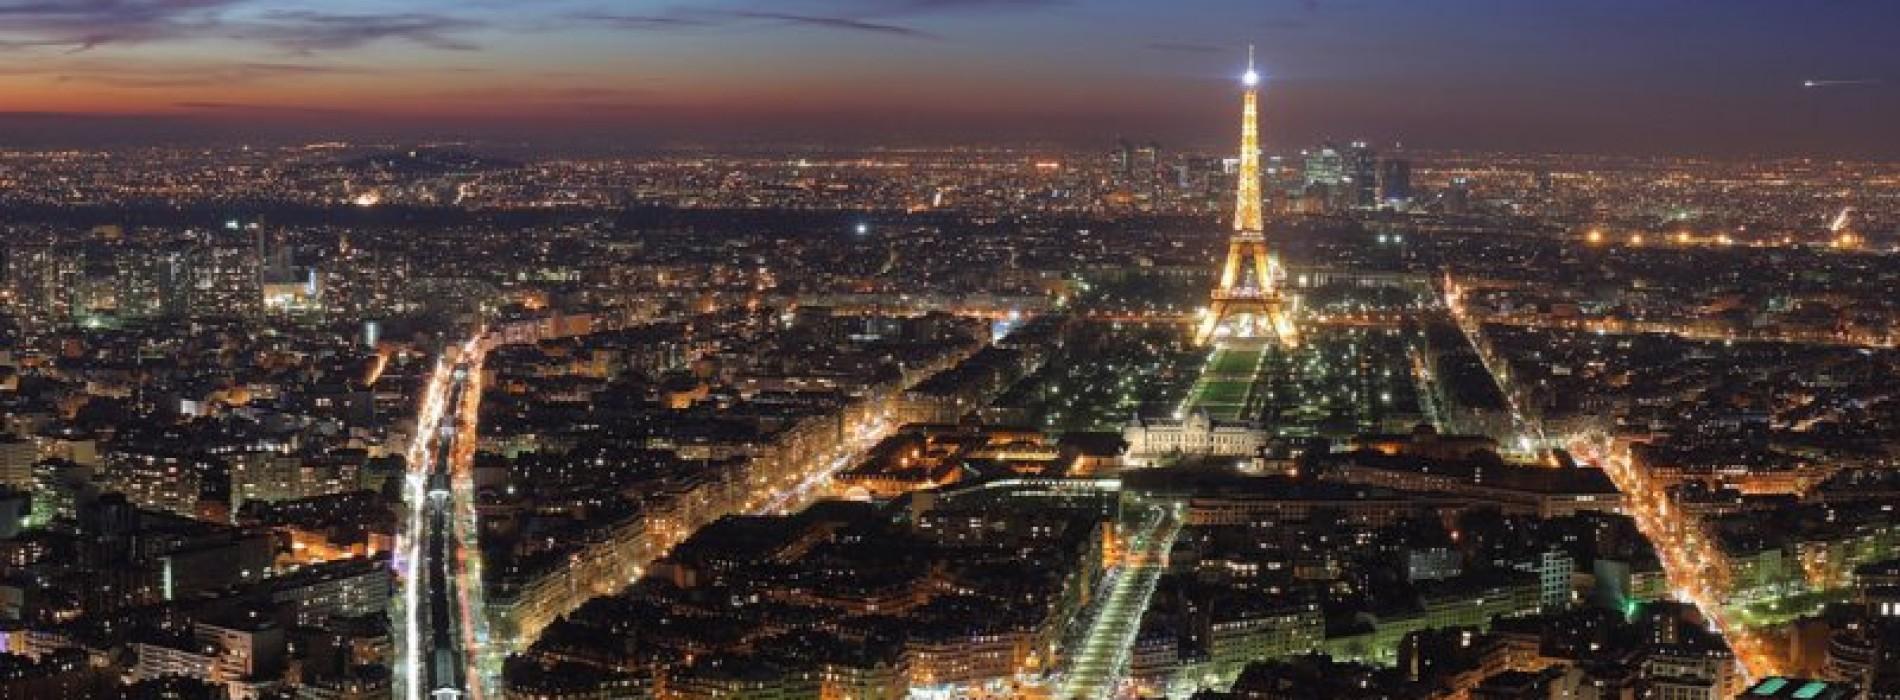 How to access Paris